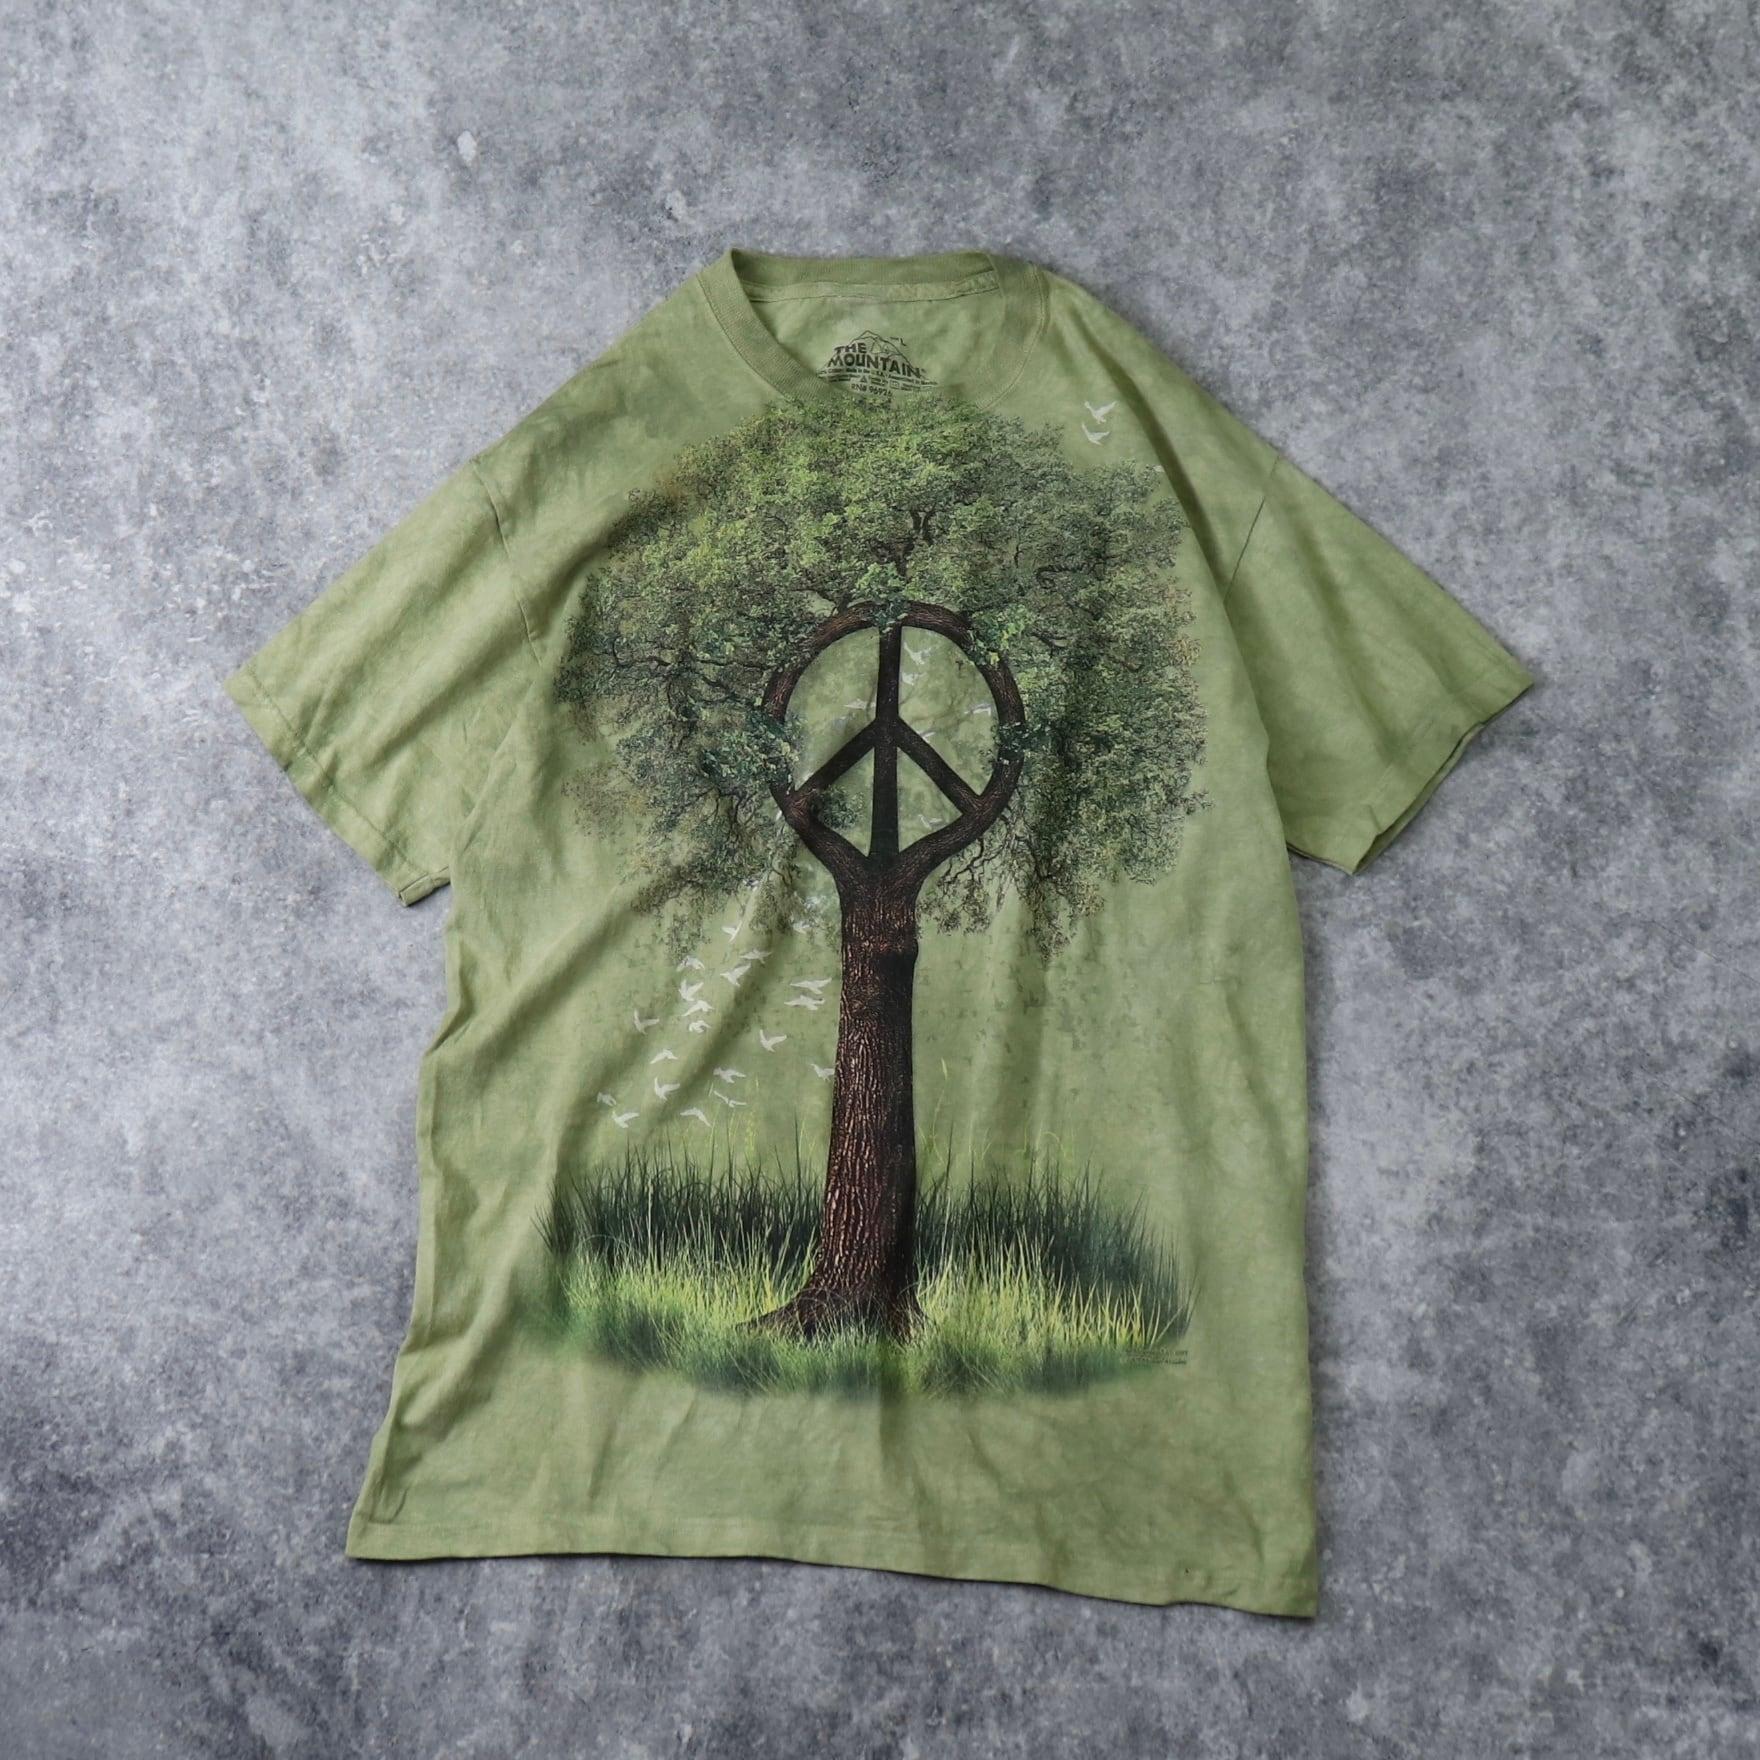 THE MOUNTAIN ザマウンテン タイダイTシャツ USA製 メンズL 古着 A463